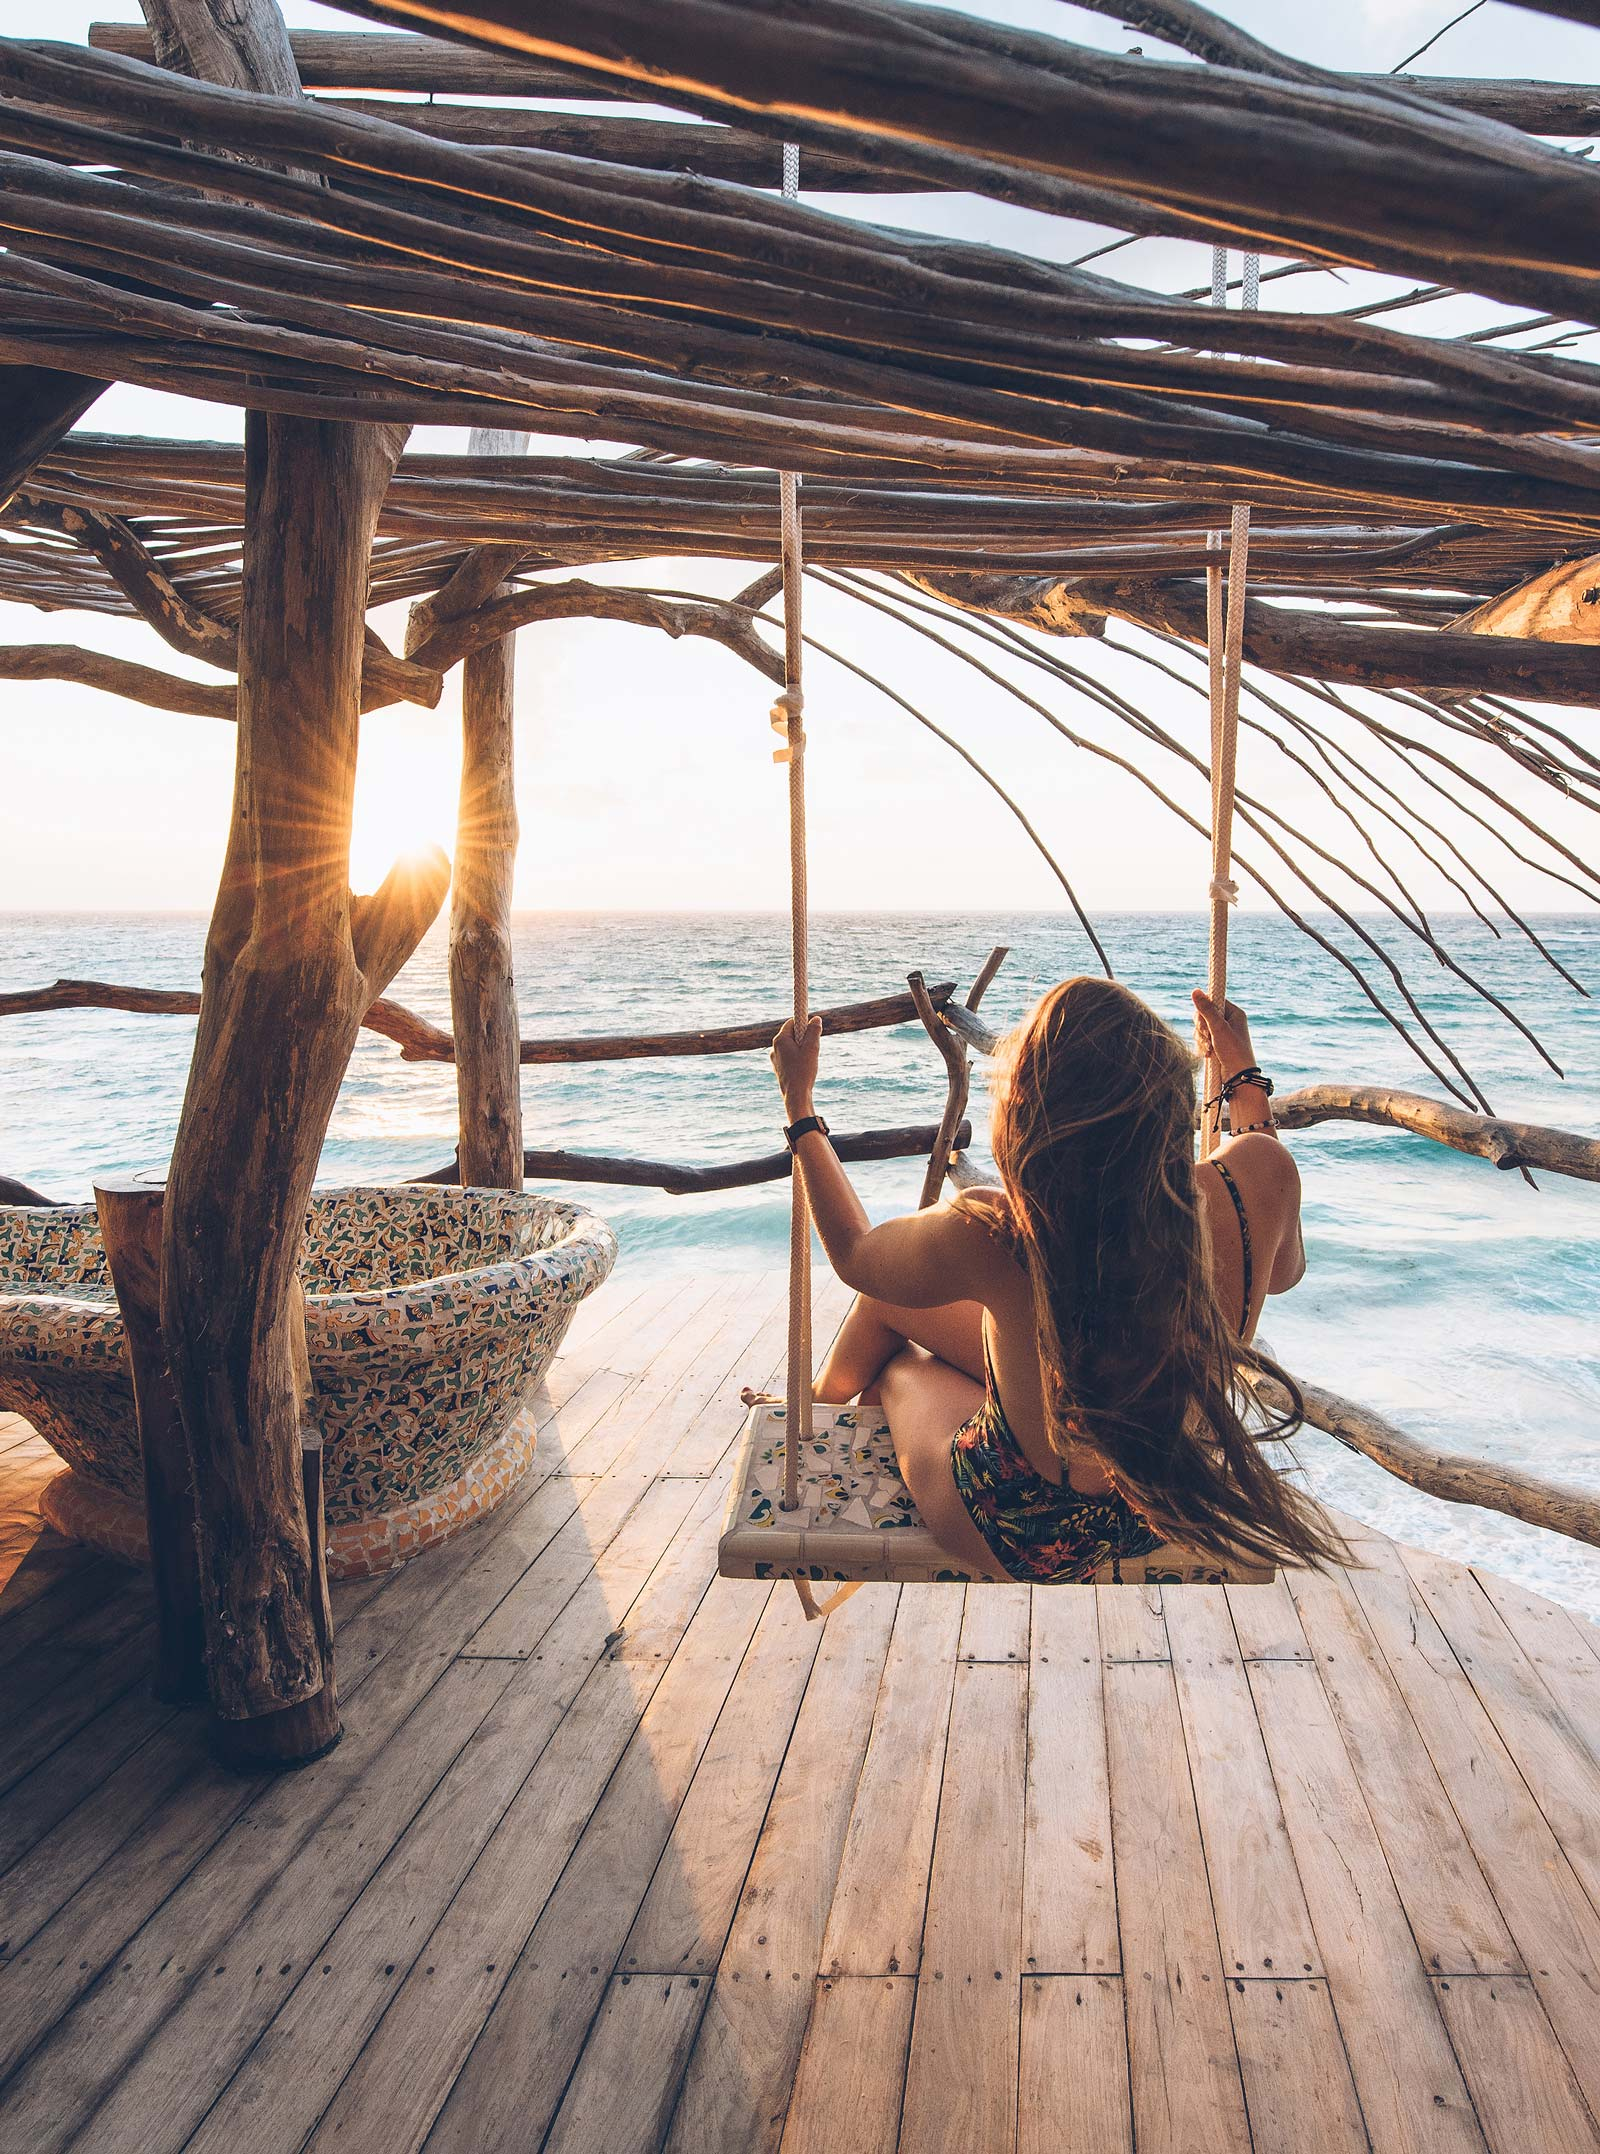 Balançoire avec vue Mer, Azulik, Tulum